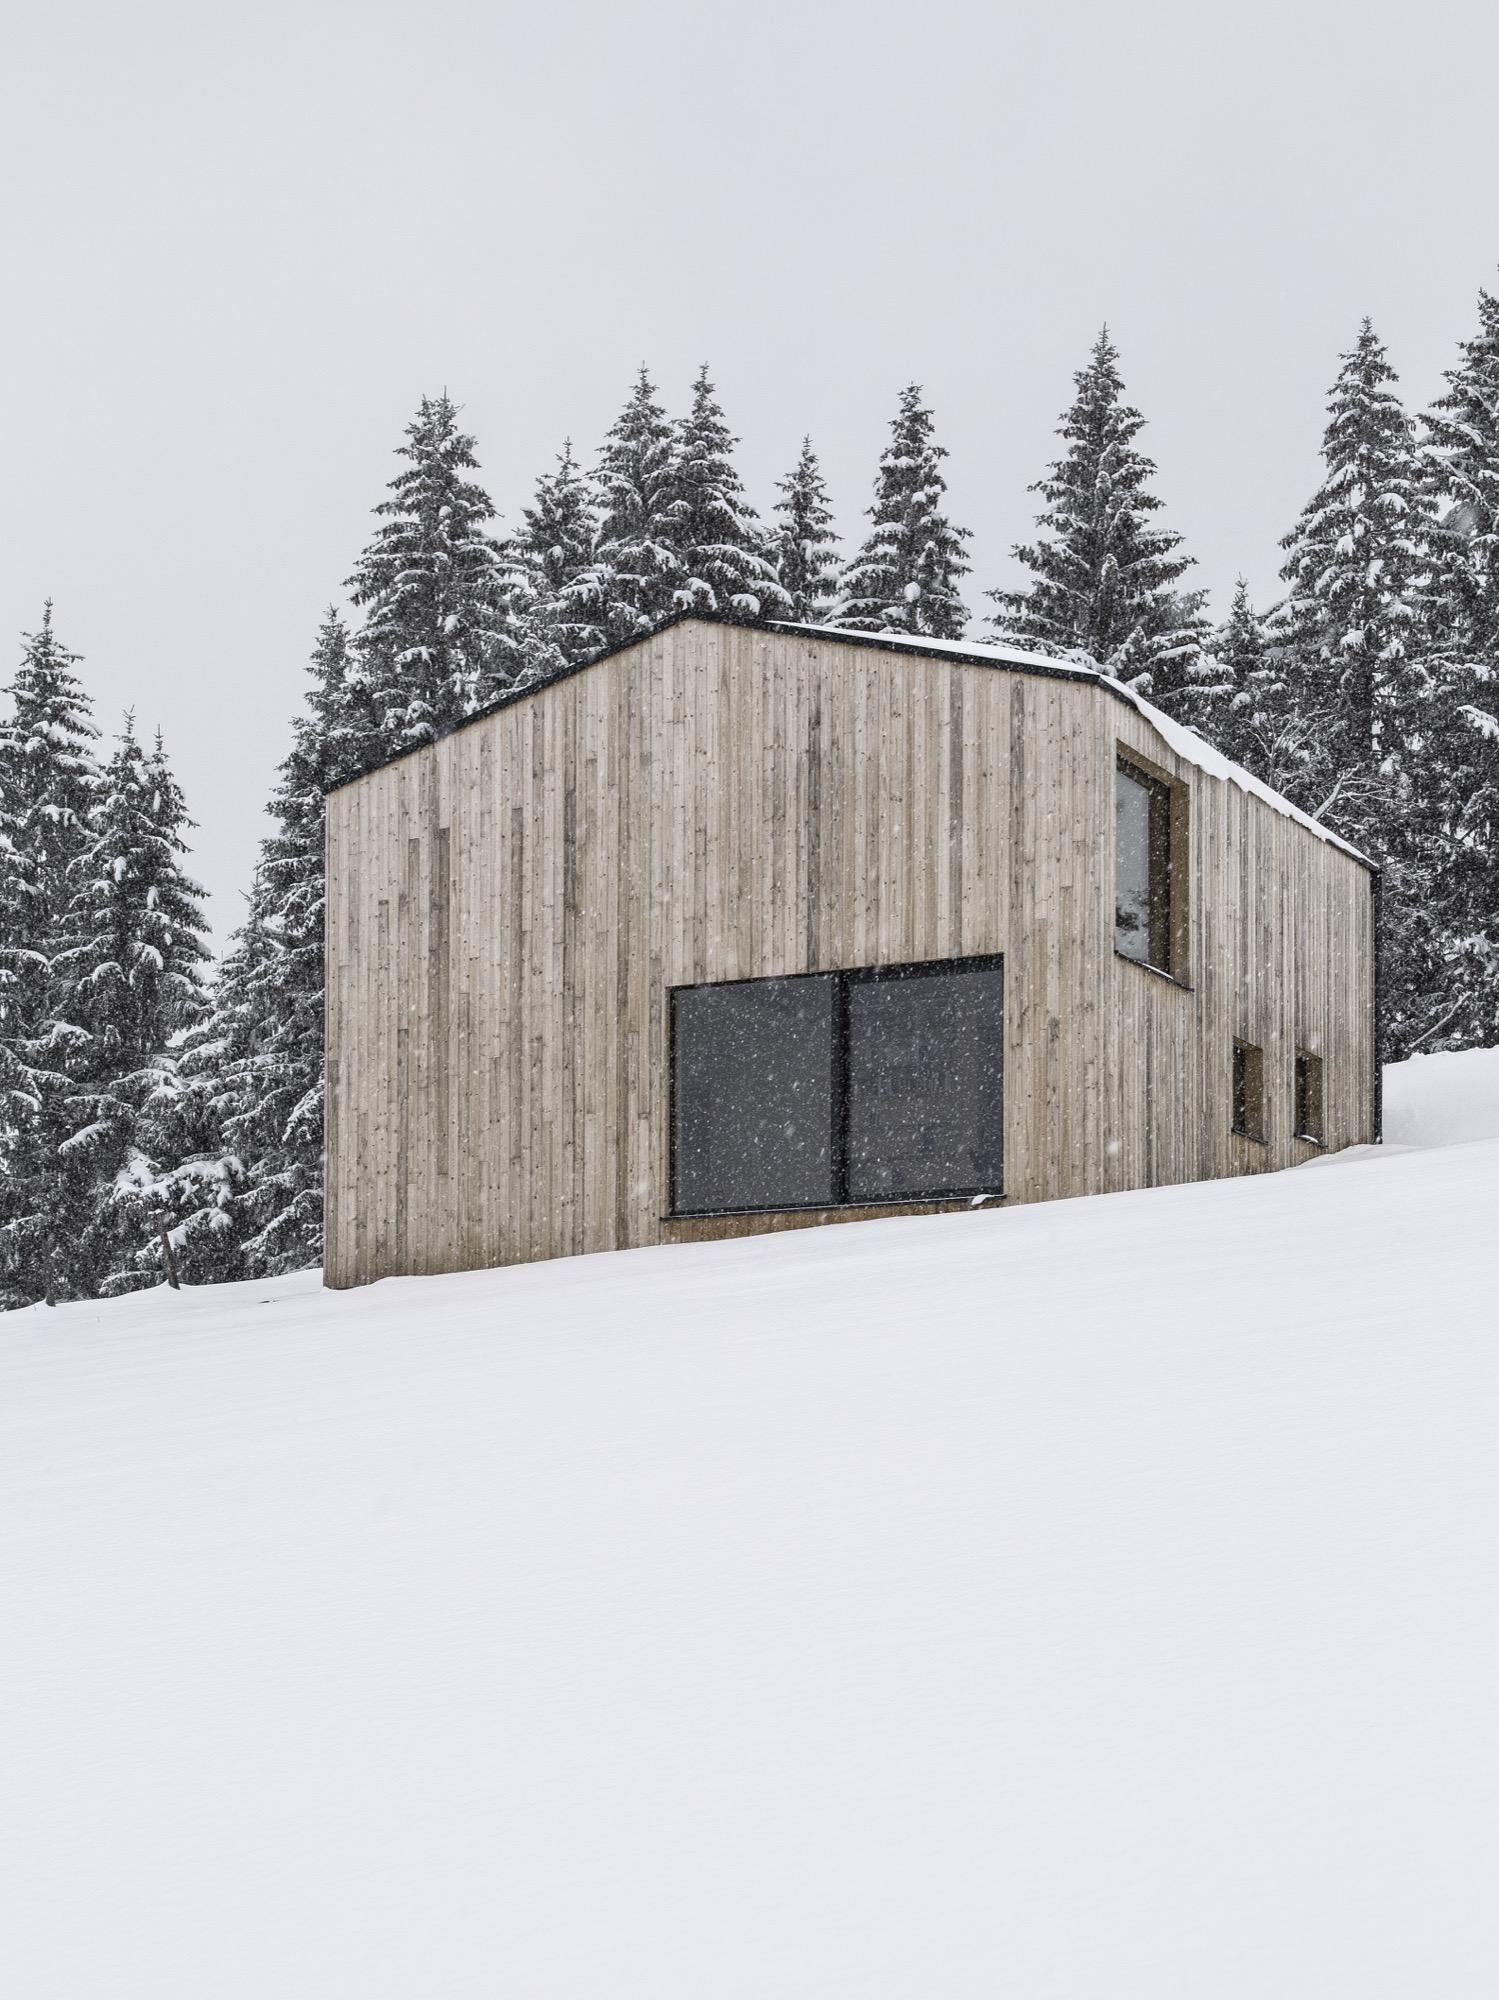 Photo by Albrecht Imanuel Schnabel